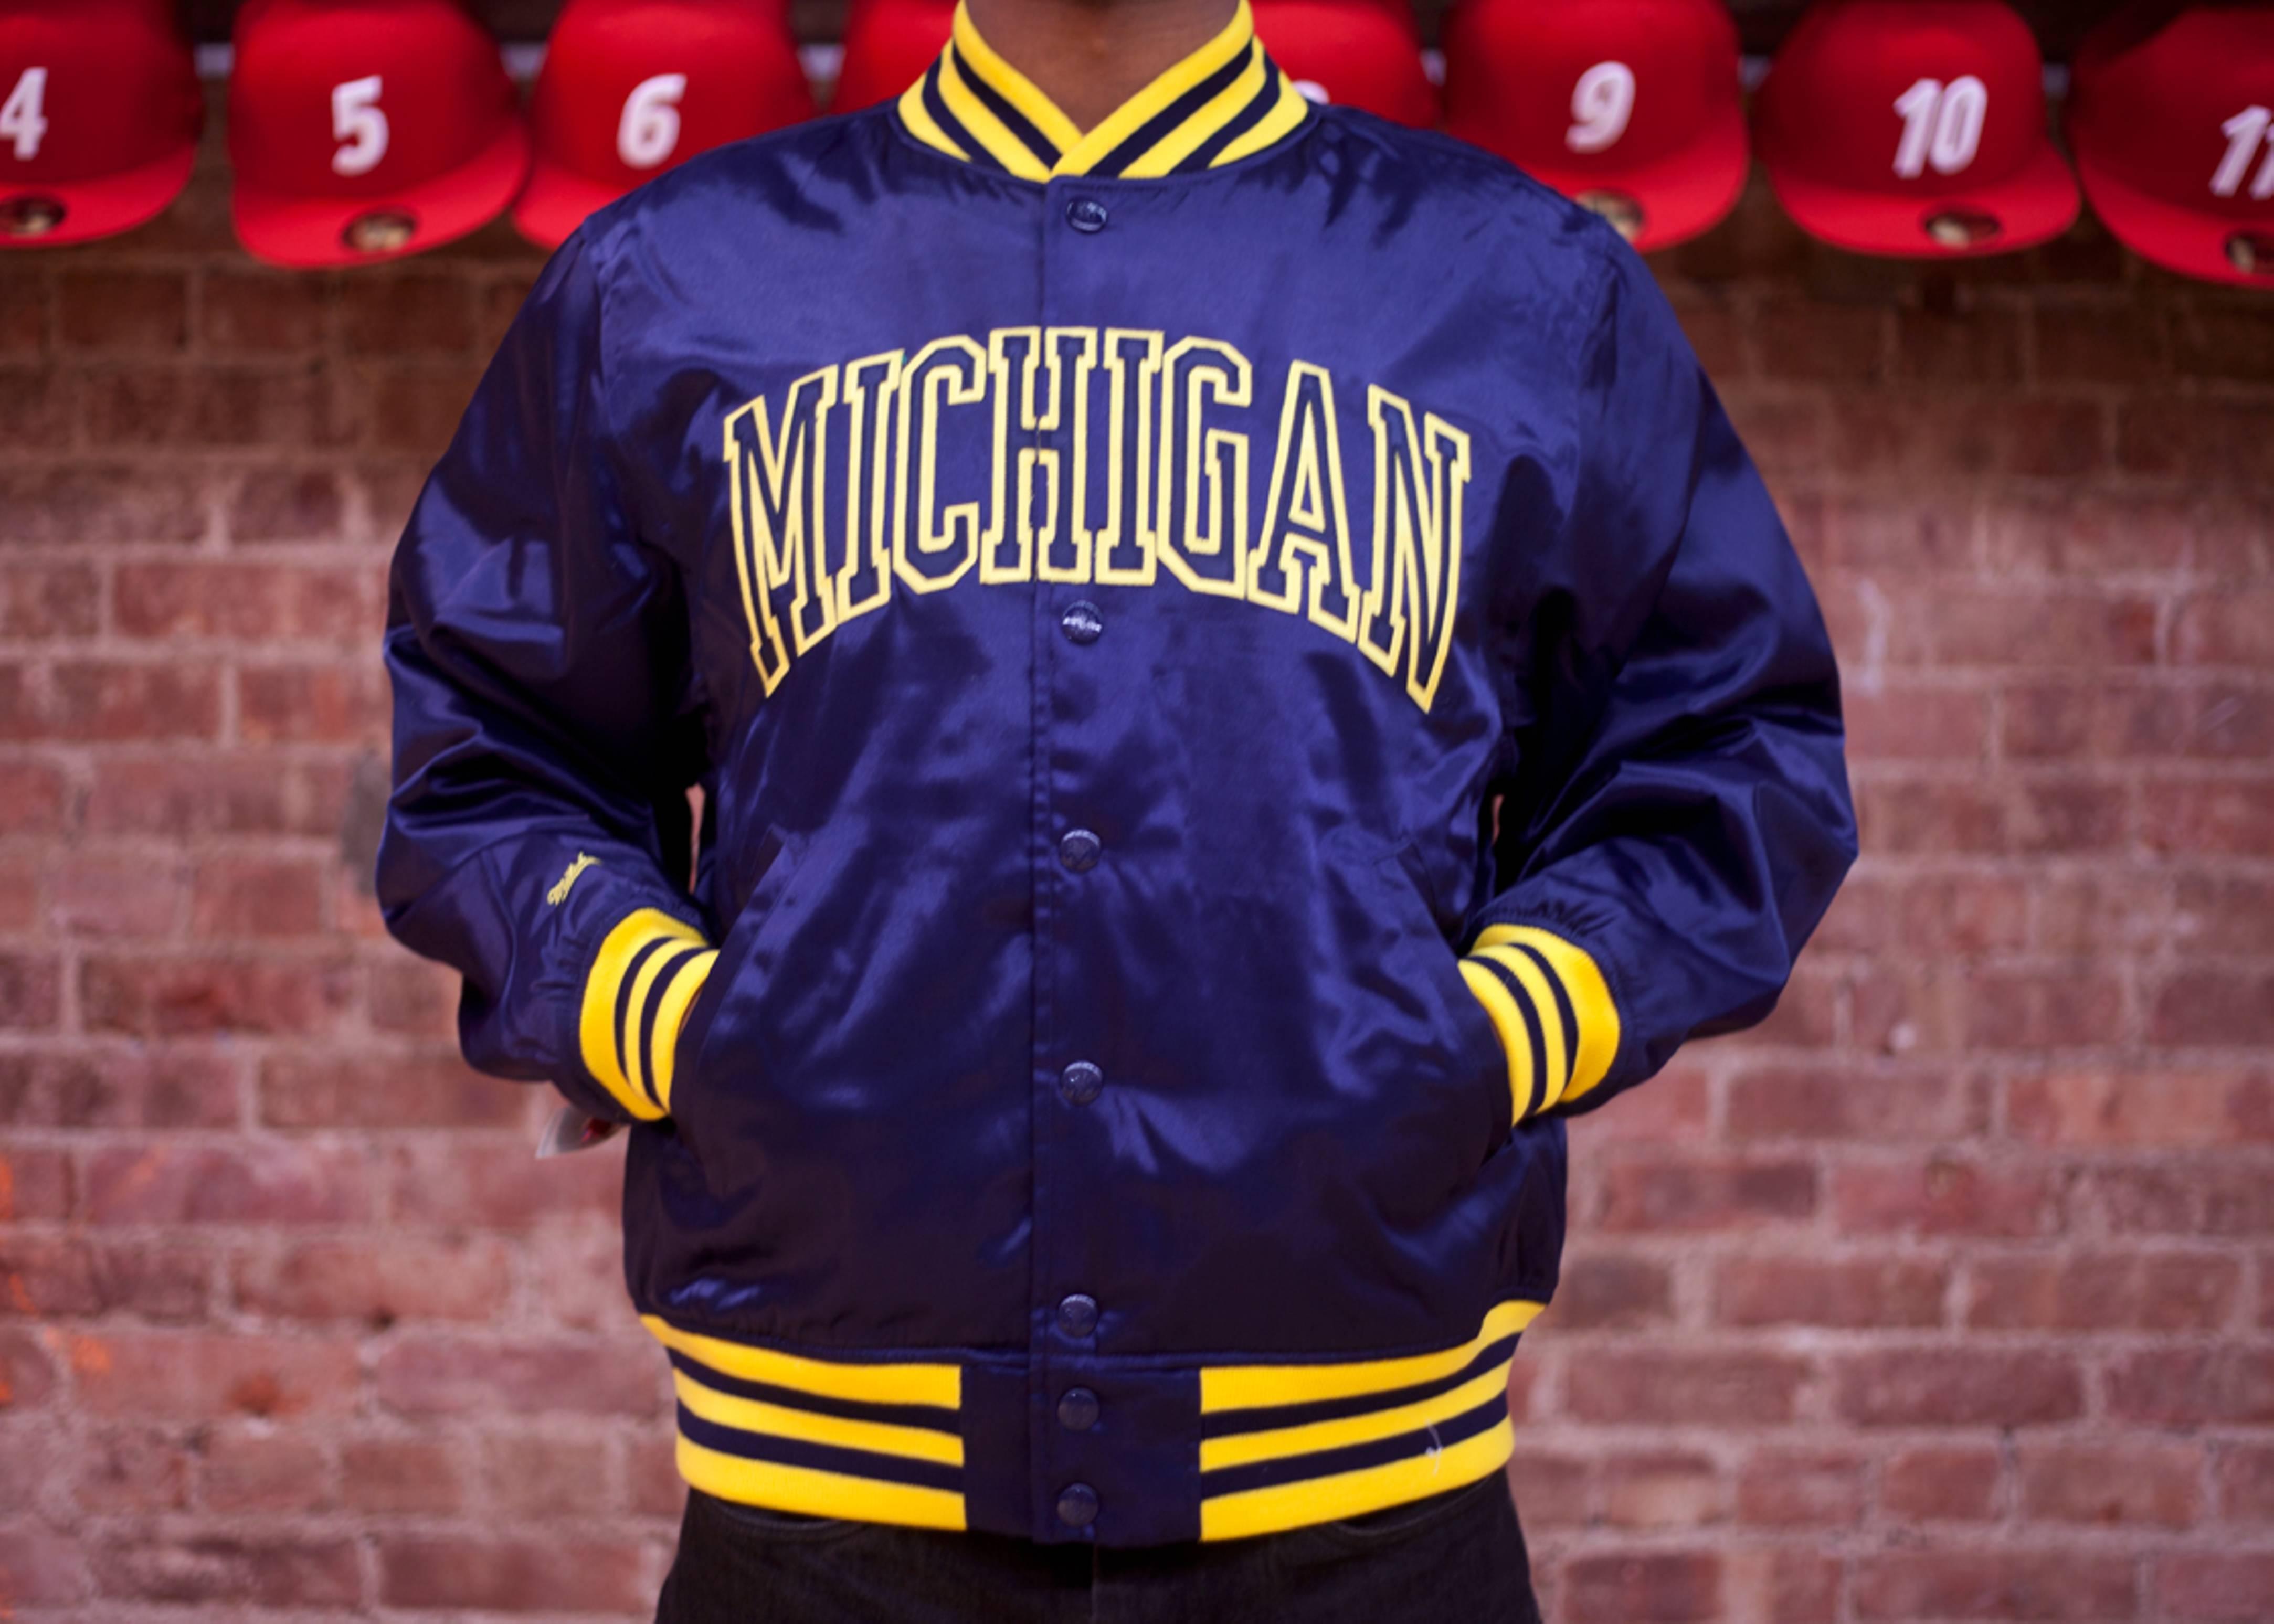 univ. of michigan satin jacket